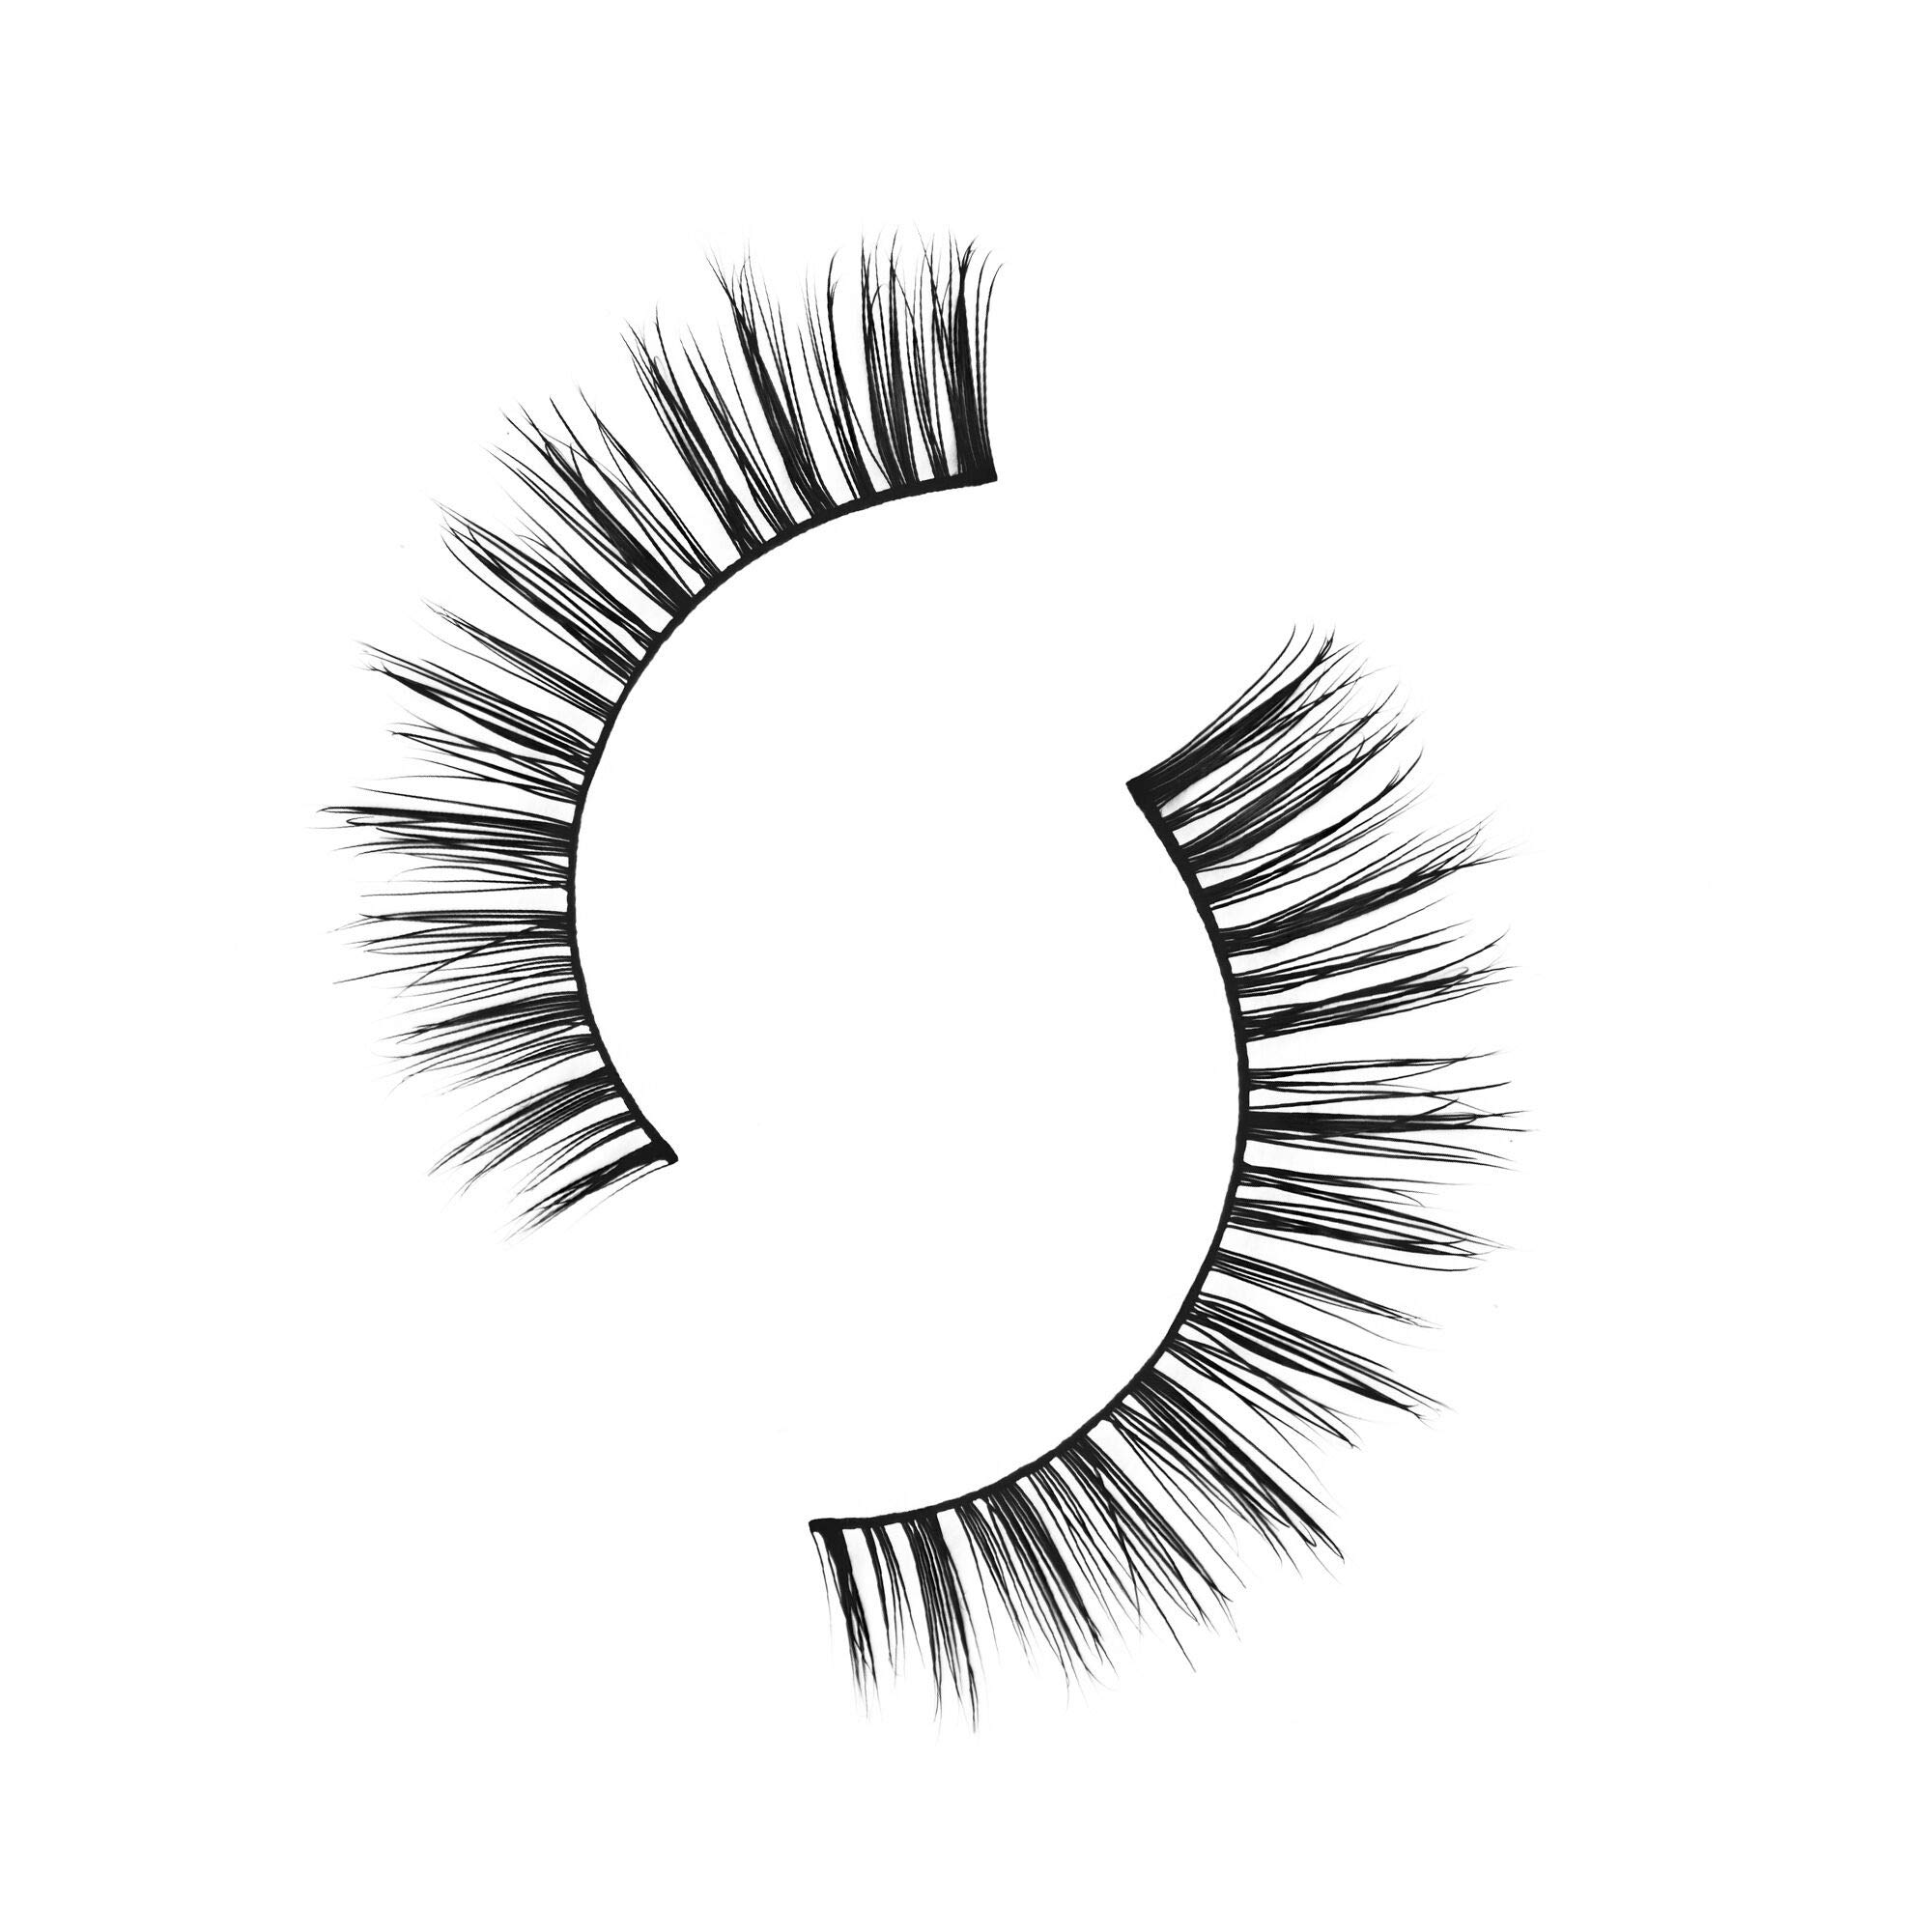 Velour Mink Lashes - Are Those Real False Eyelashes – Handcrafted & Cruelty Free - Lightweight Cotton Lash Band - Lasts Average 25 Uses - Natural Volume Fake Eyelashes - Suitable for All Eye Shapes